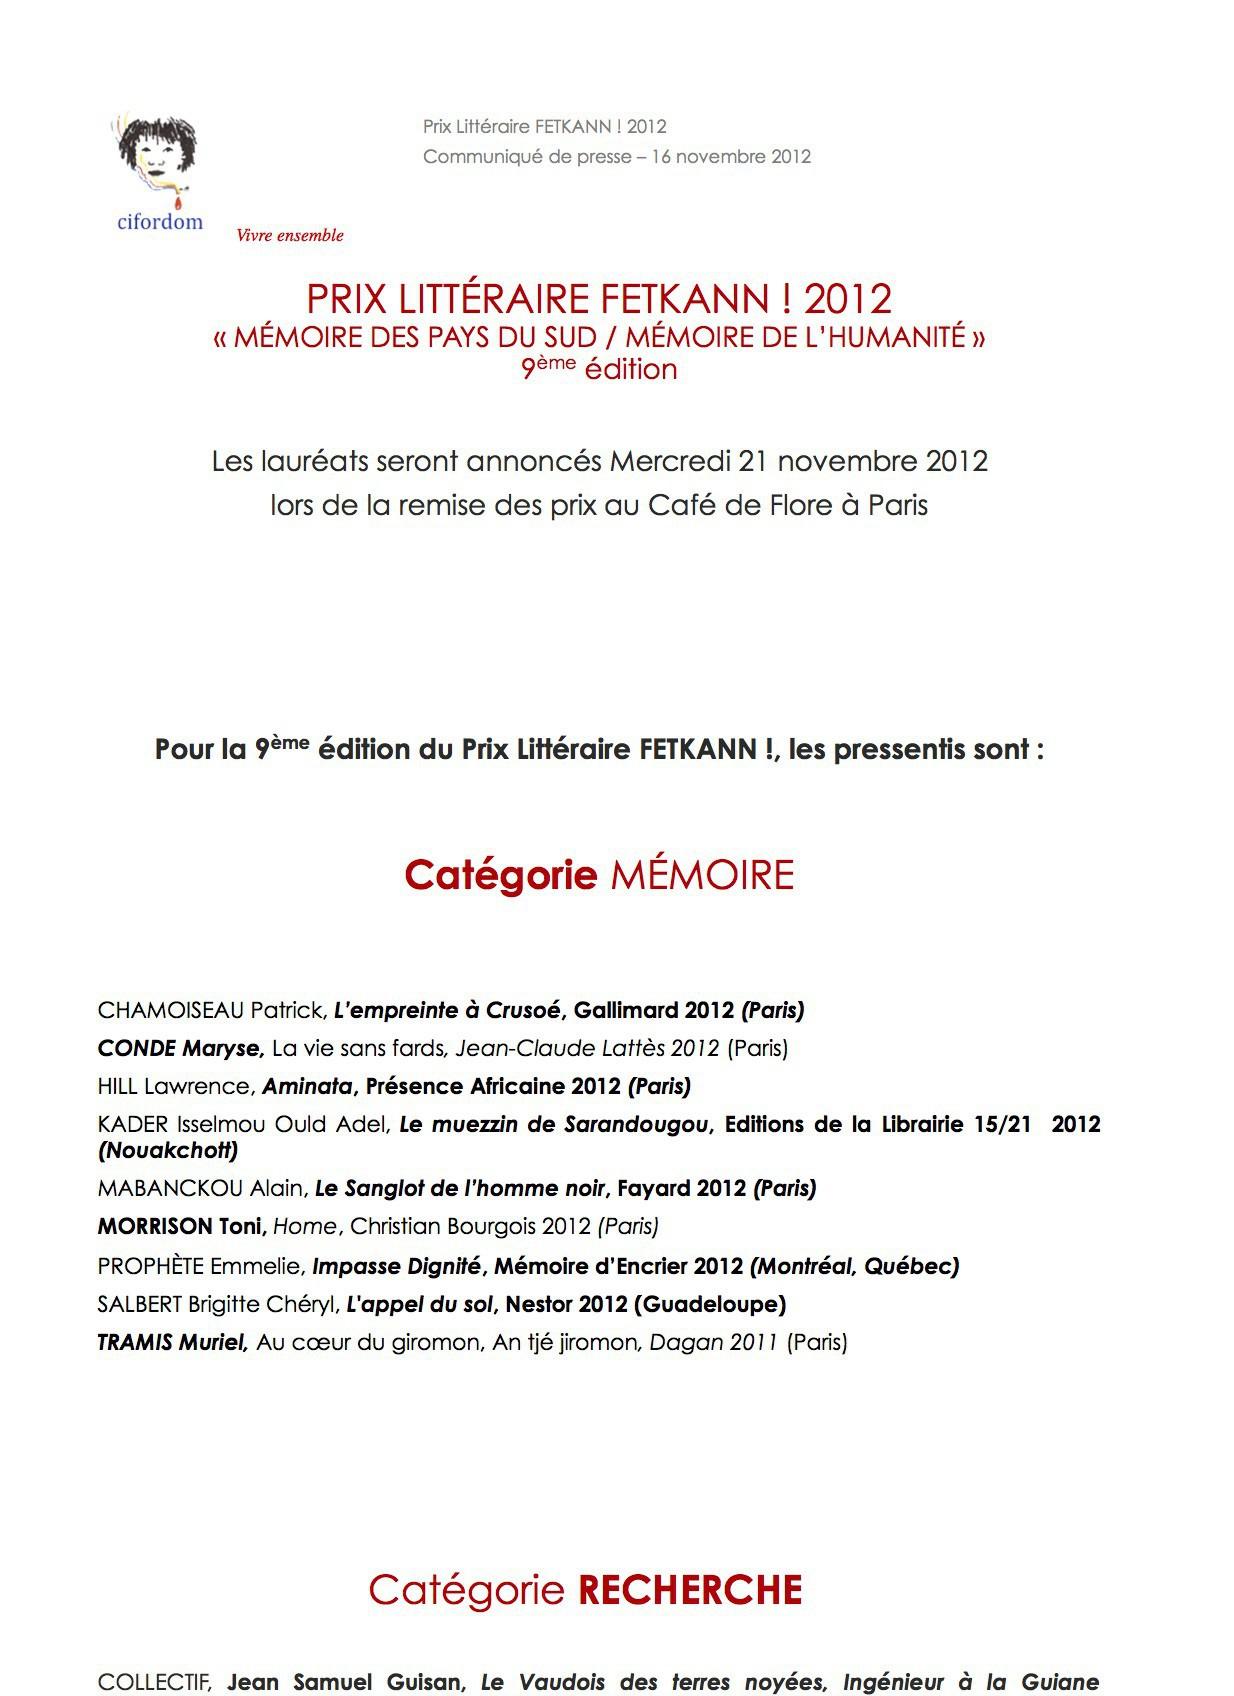 CP Prix_FETKANN_Pressentis 2012-1